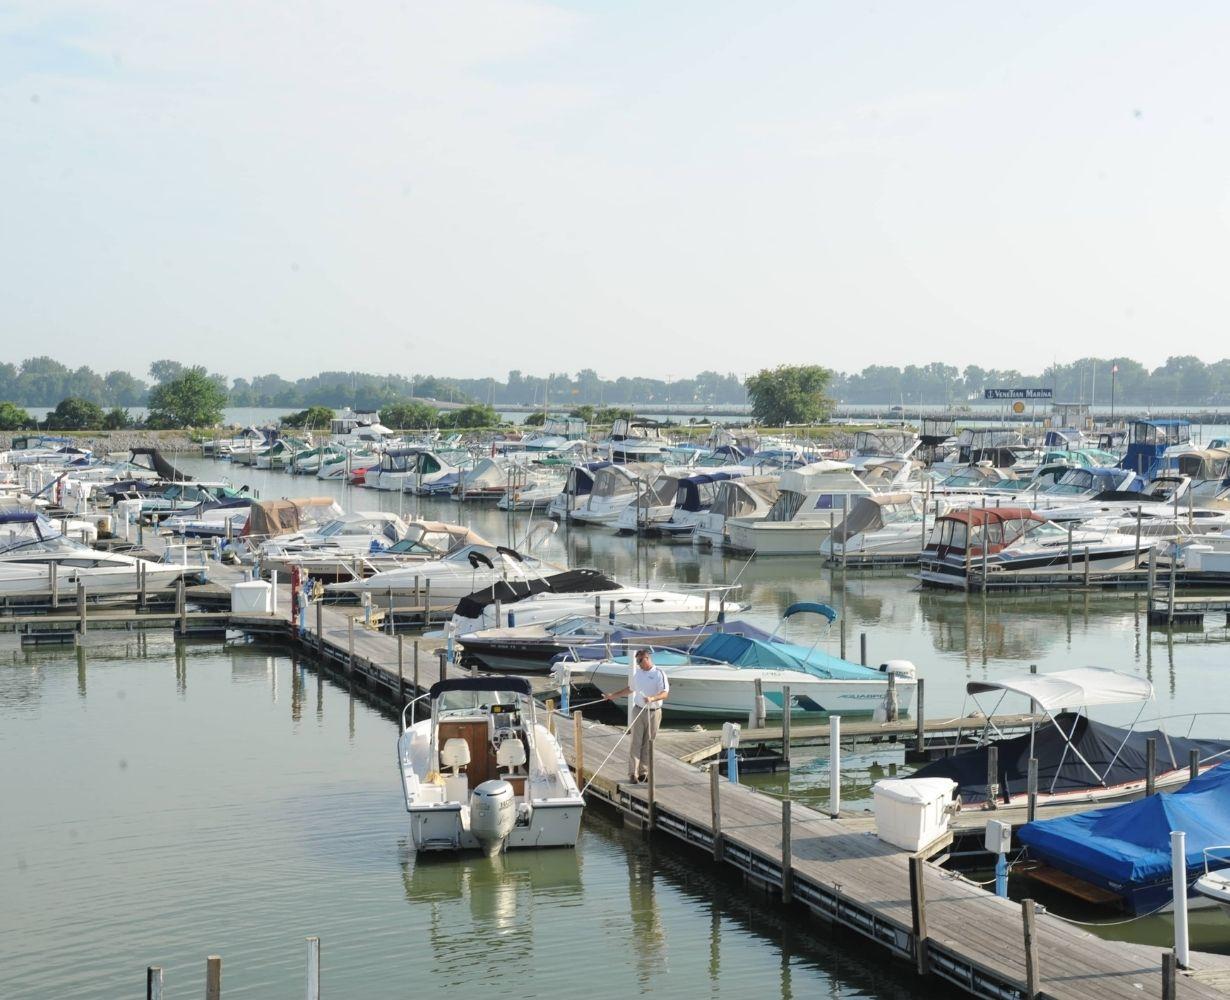 venetian-marina-sandusky-ohio-gallery-docks-1